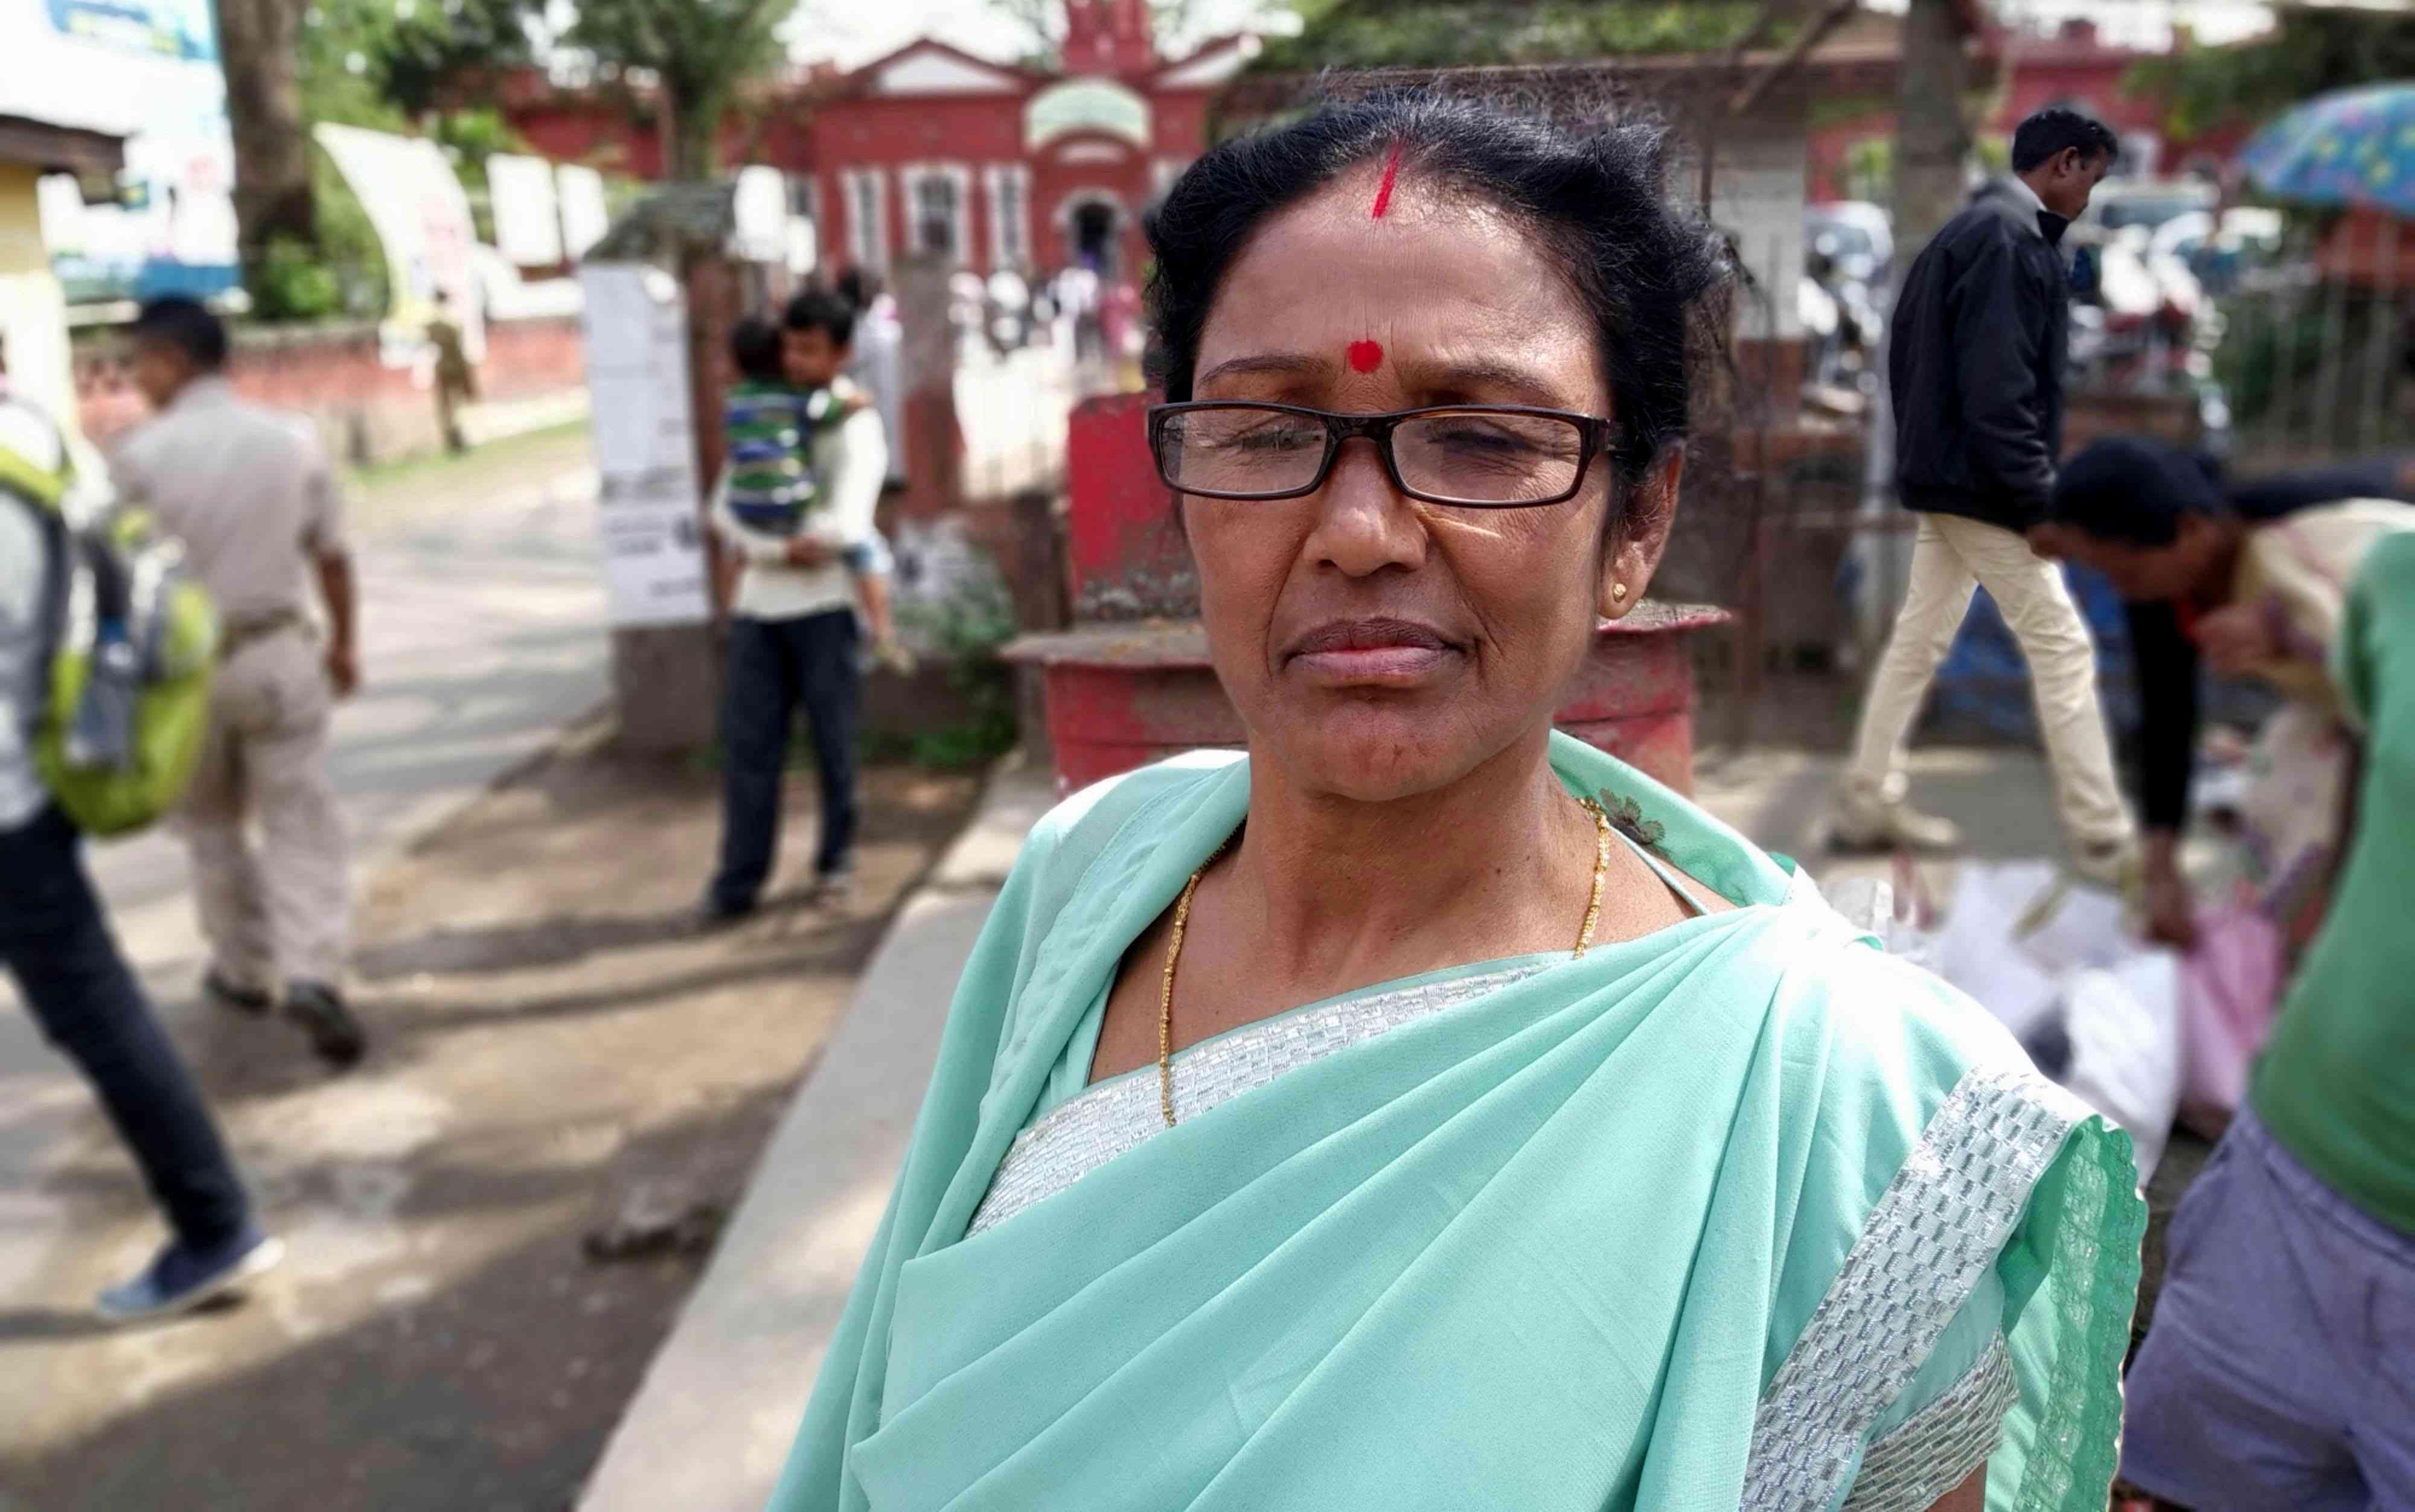 Mamoni Bora is a homemaker in Jorhat town. Photo credit: Arunabh Saikia